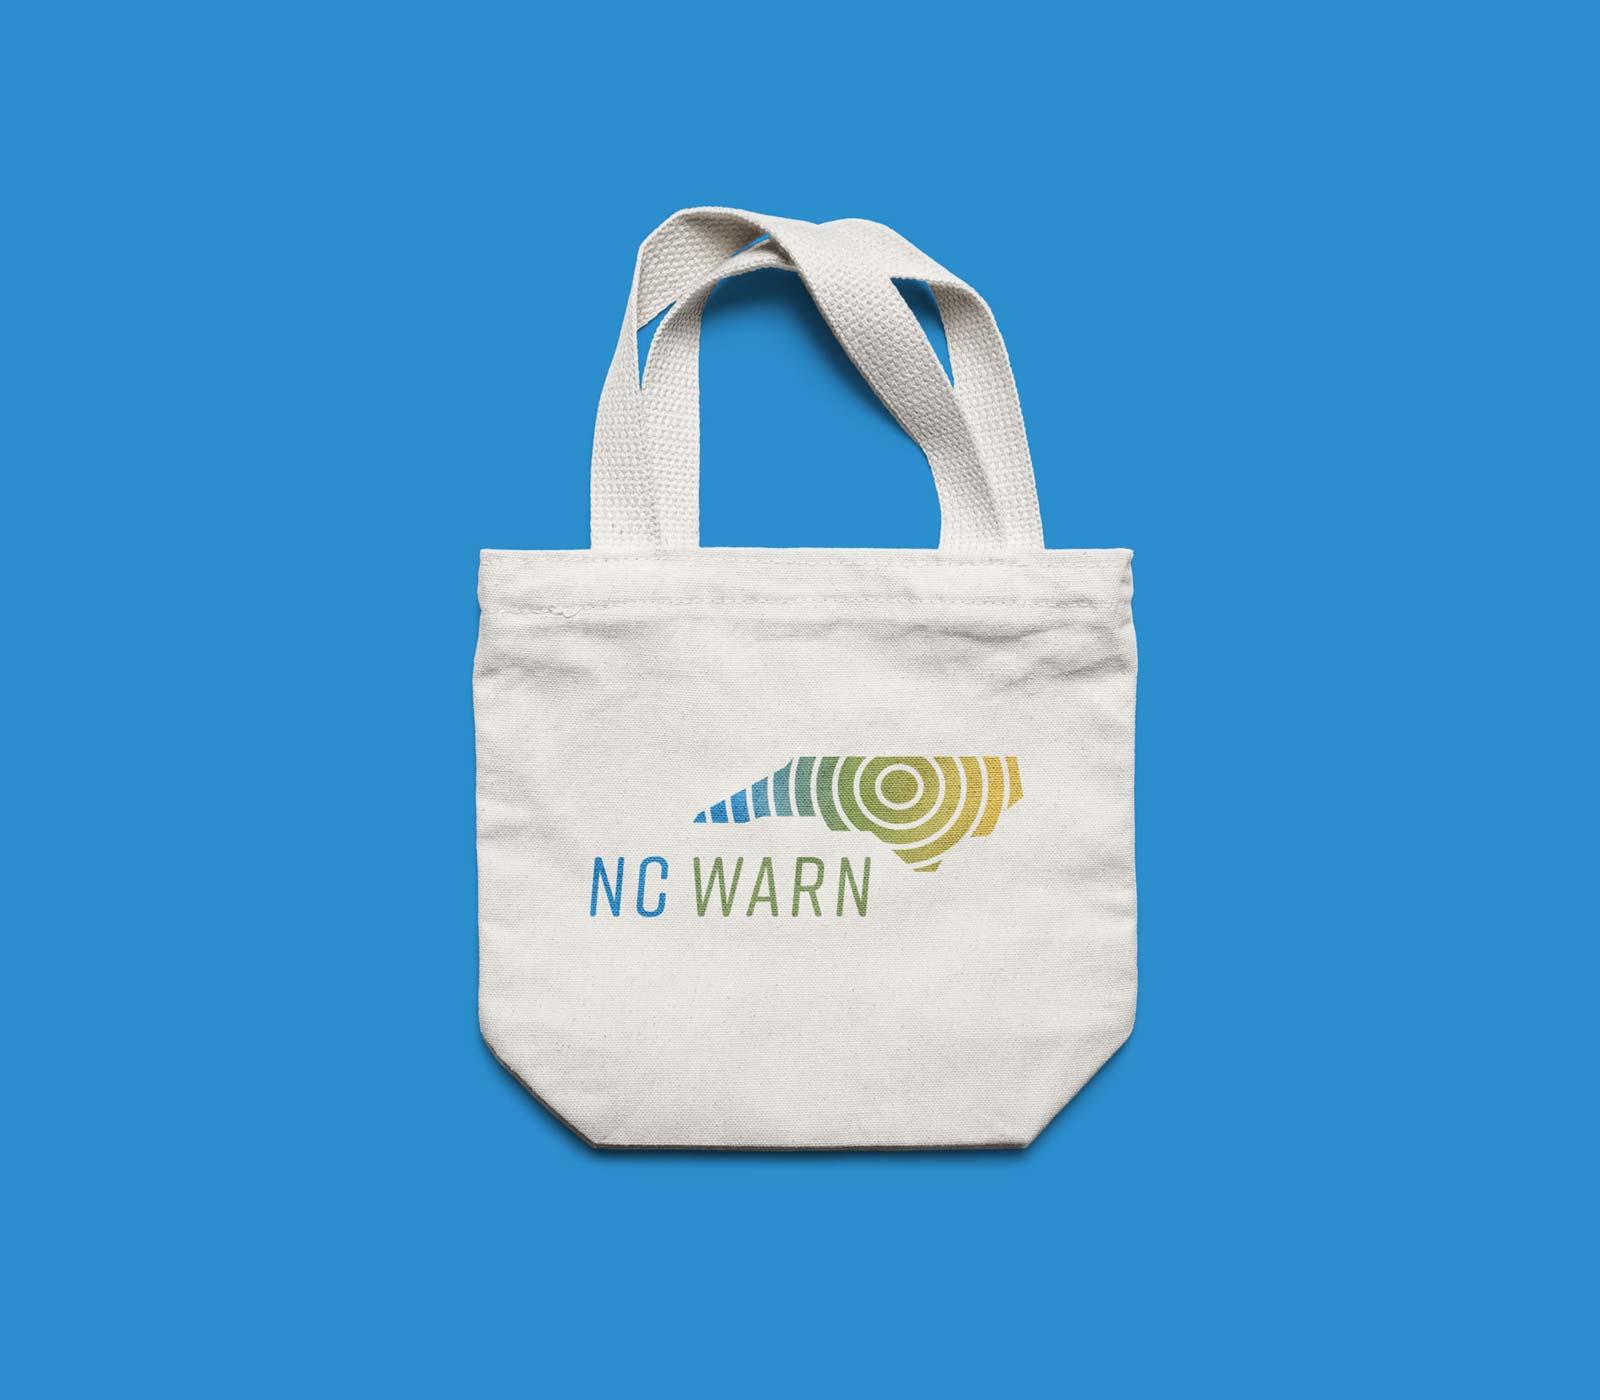 NC WARN tote bag design